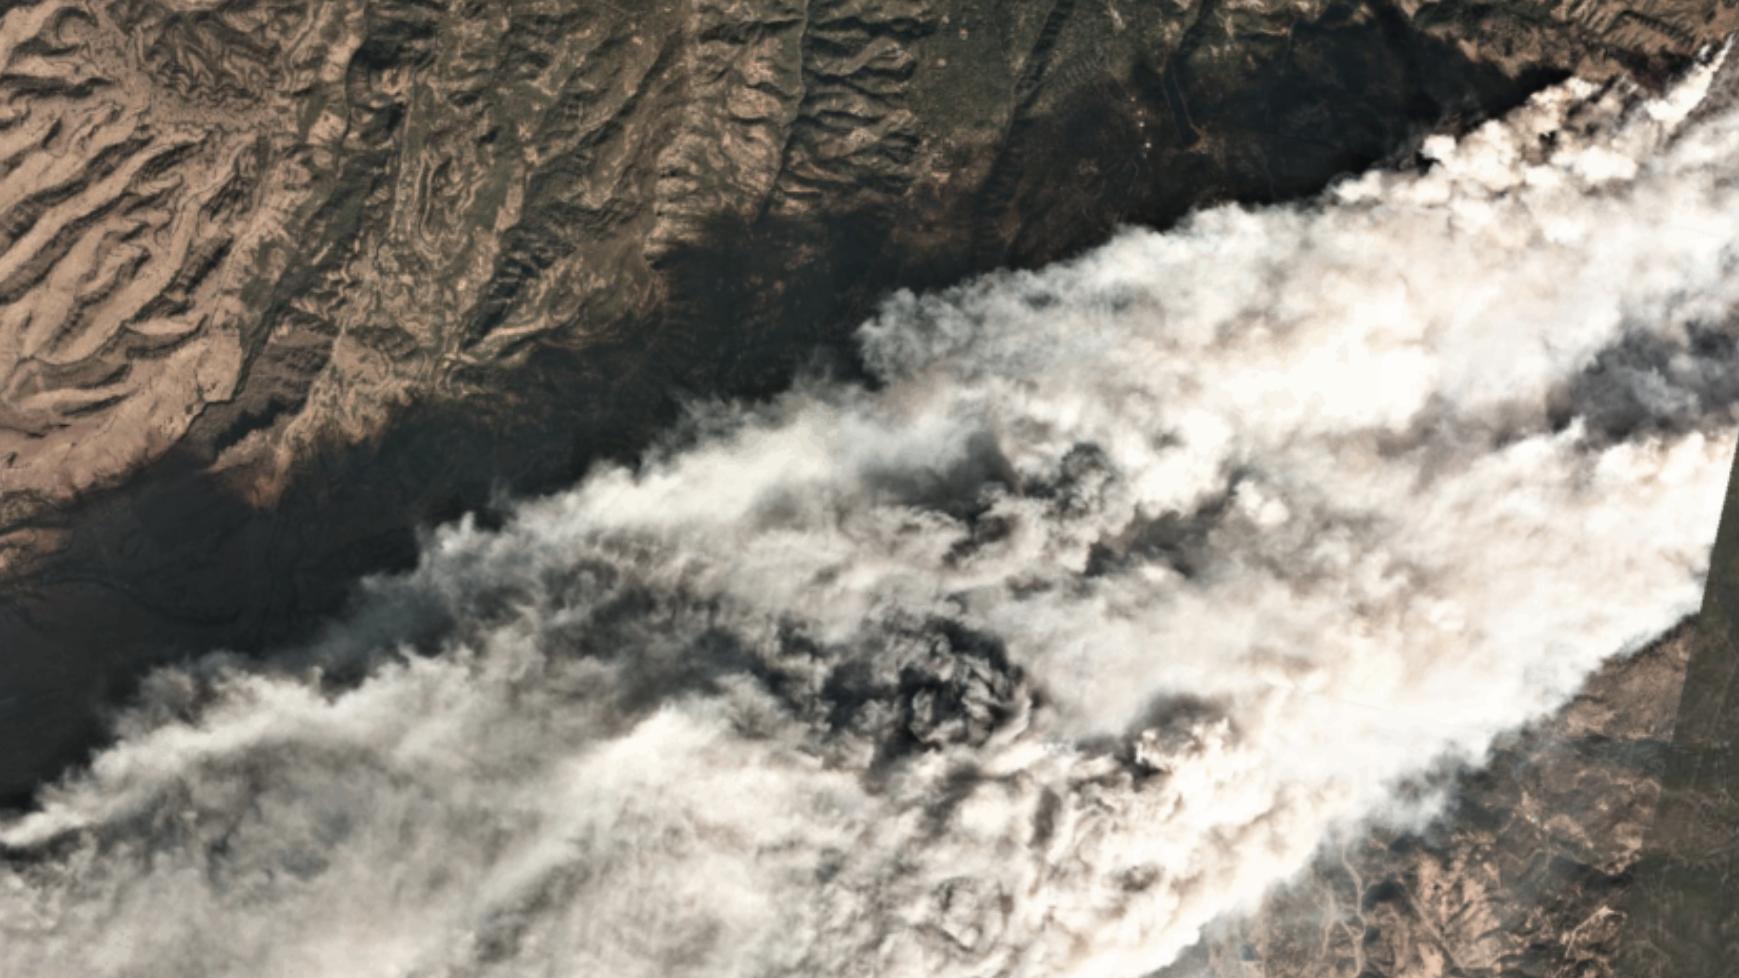 qz.com - Tim Fernholz - How tiny satellites helped California fight fires